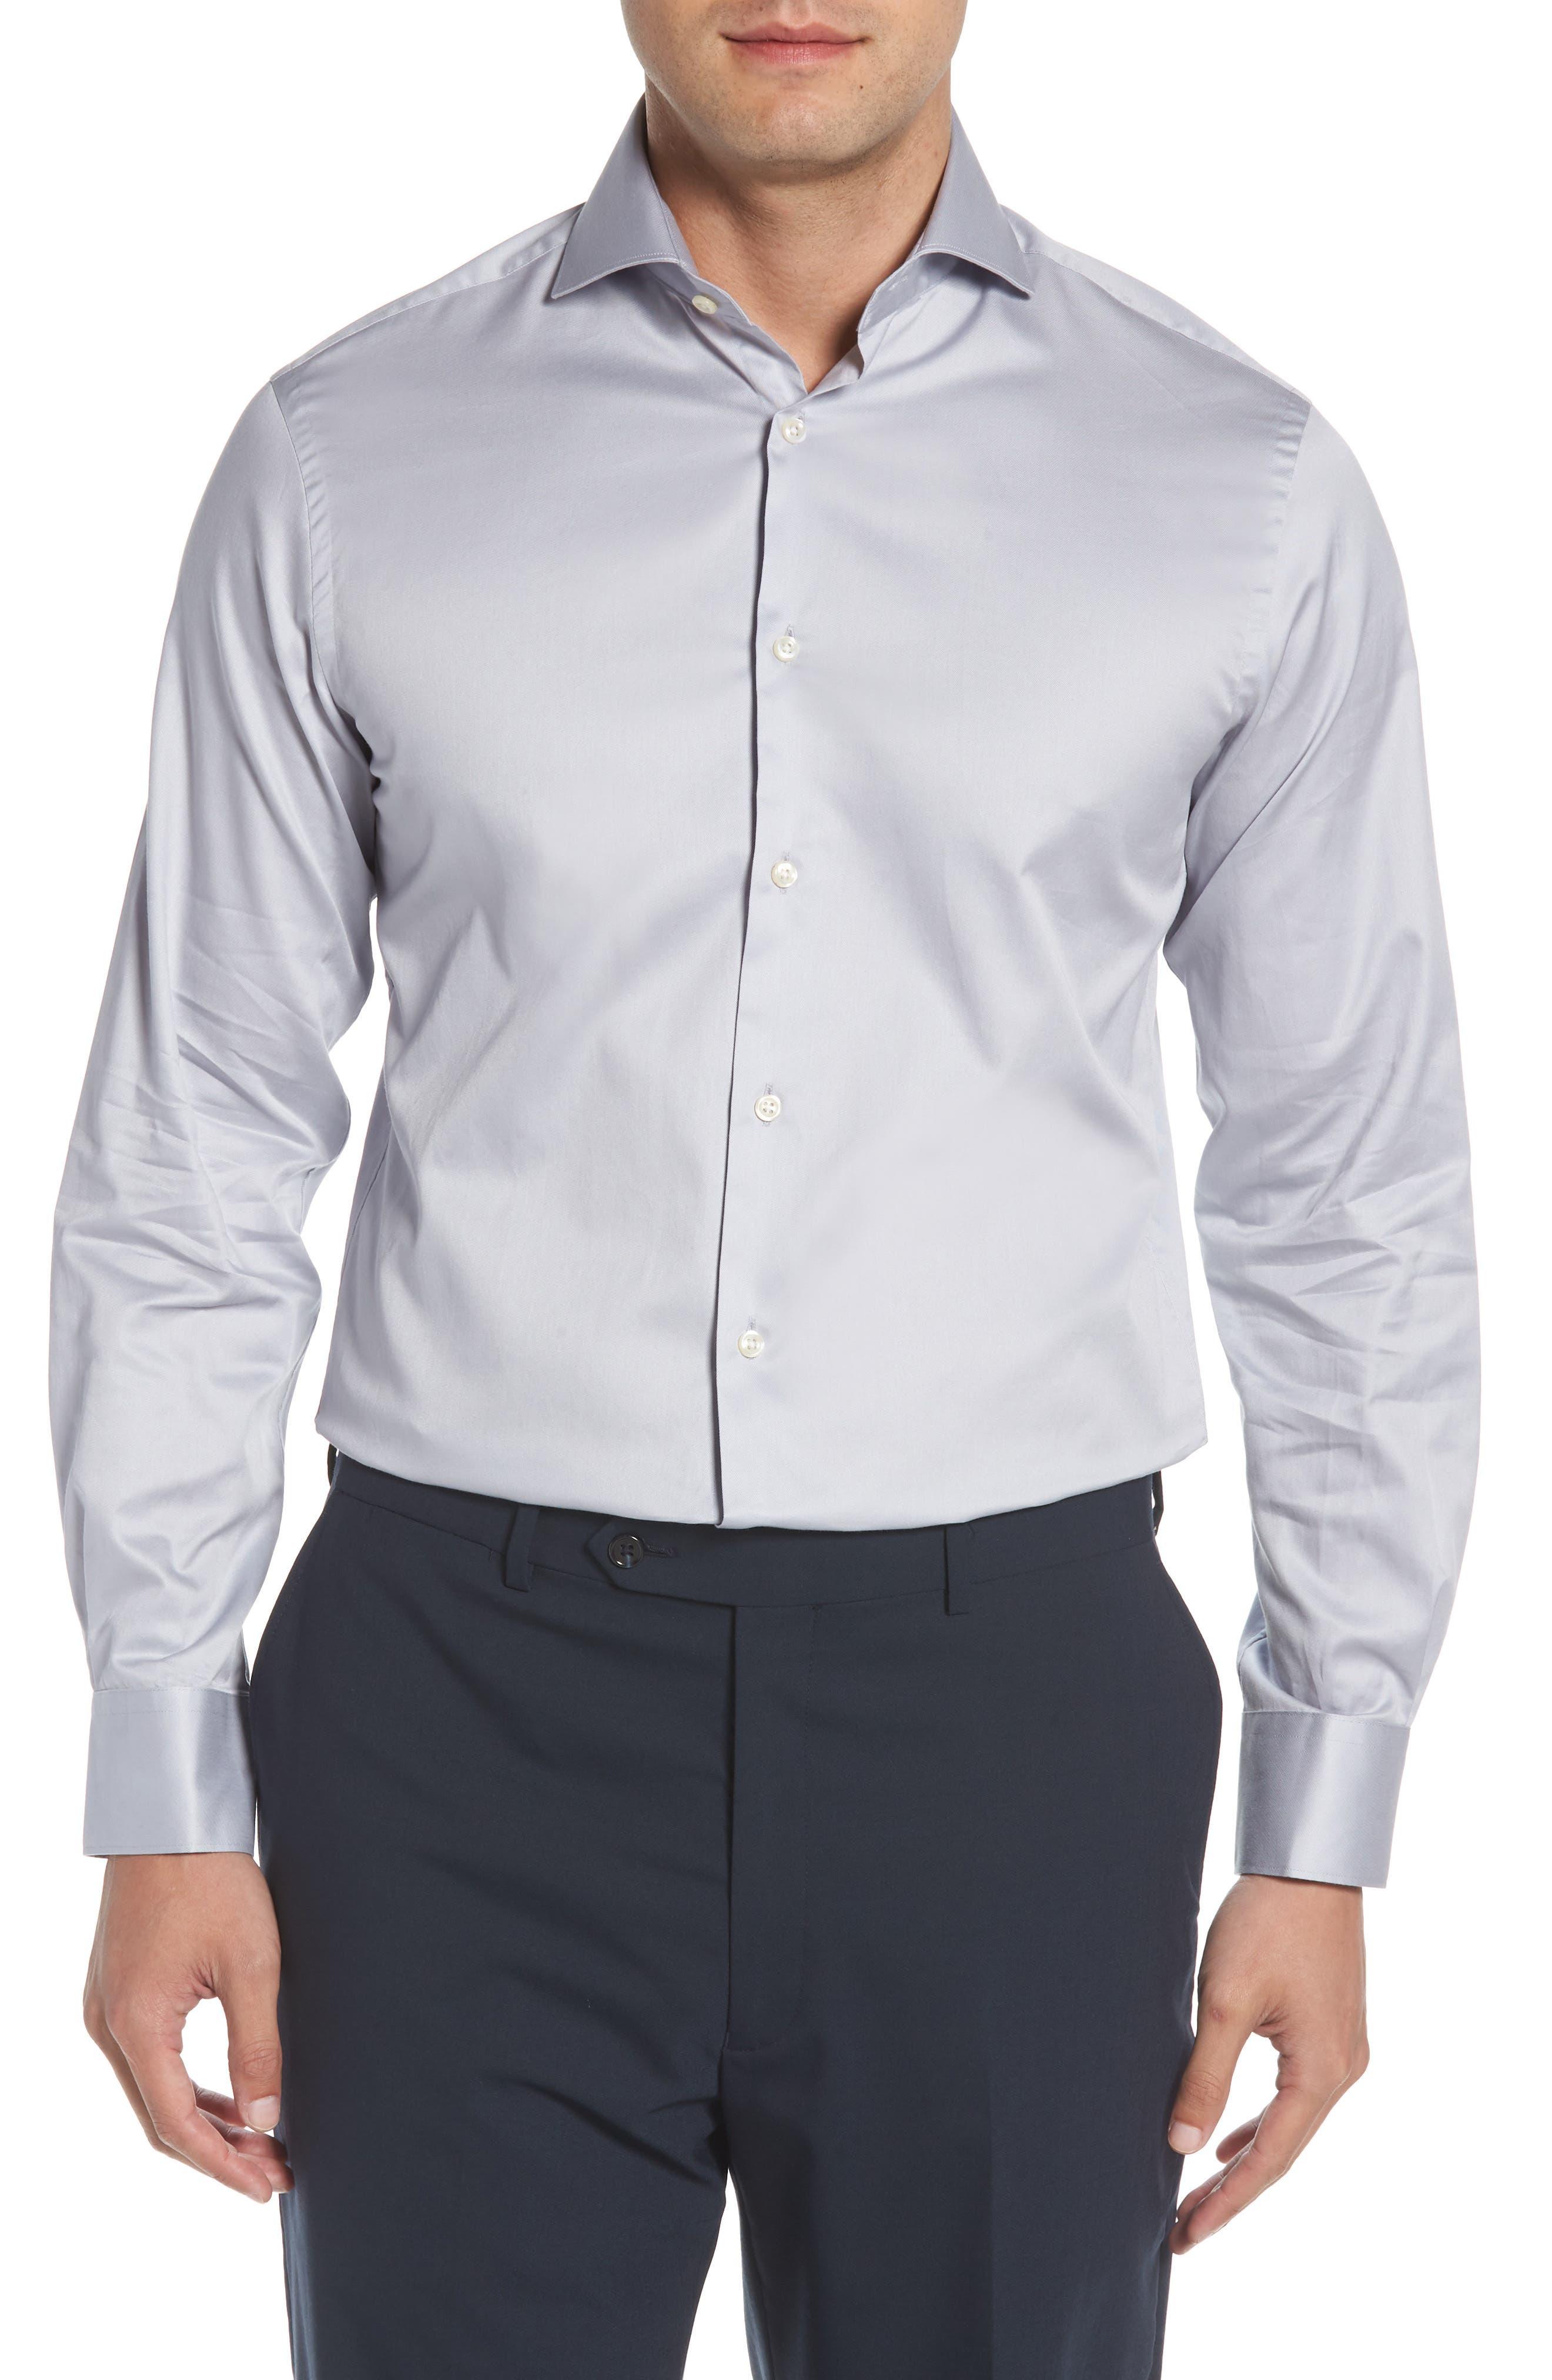 Regular Fit Solid Dress Shirt,                             Main thumbnail 1, color,                             020